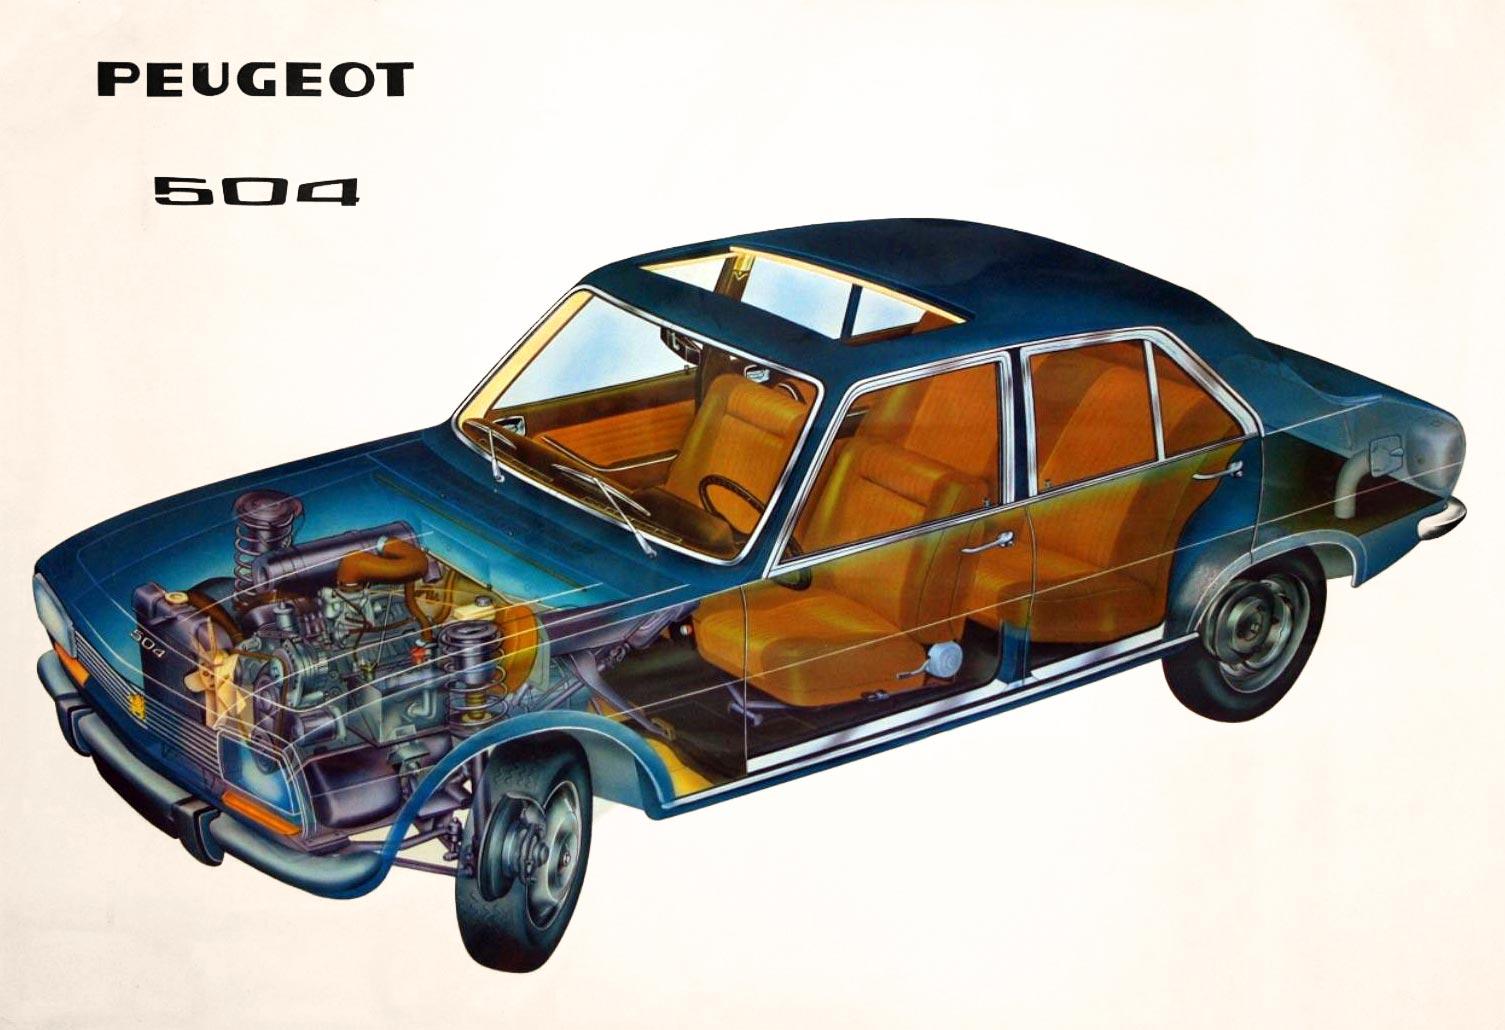 Peugeot 504 cutaway